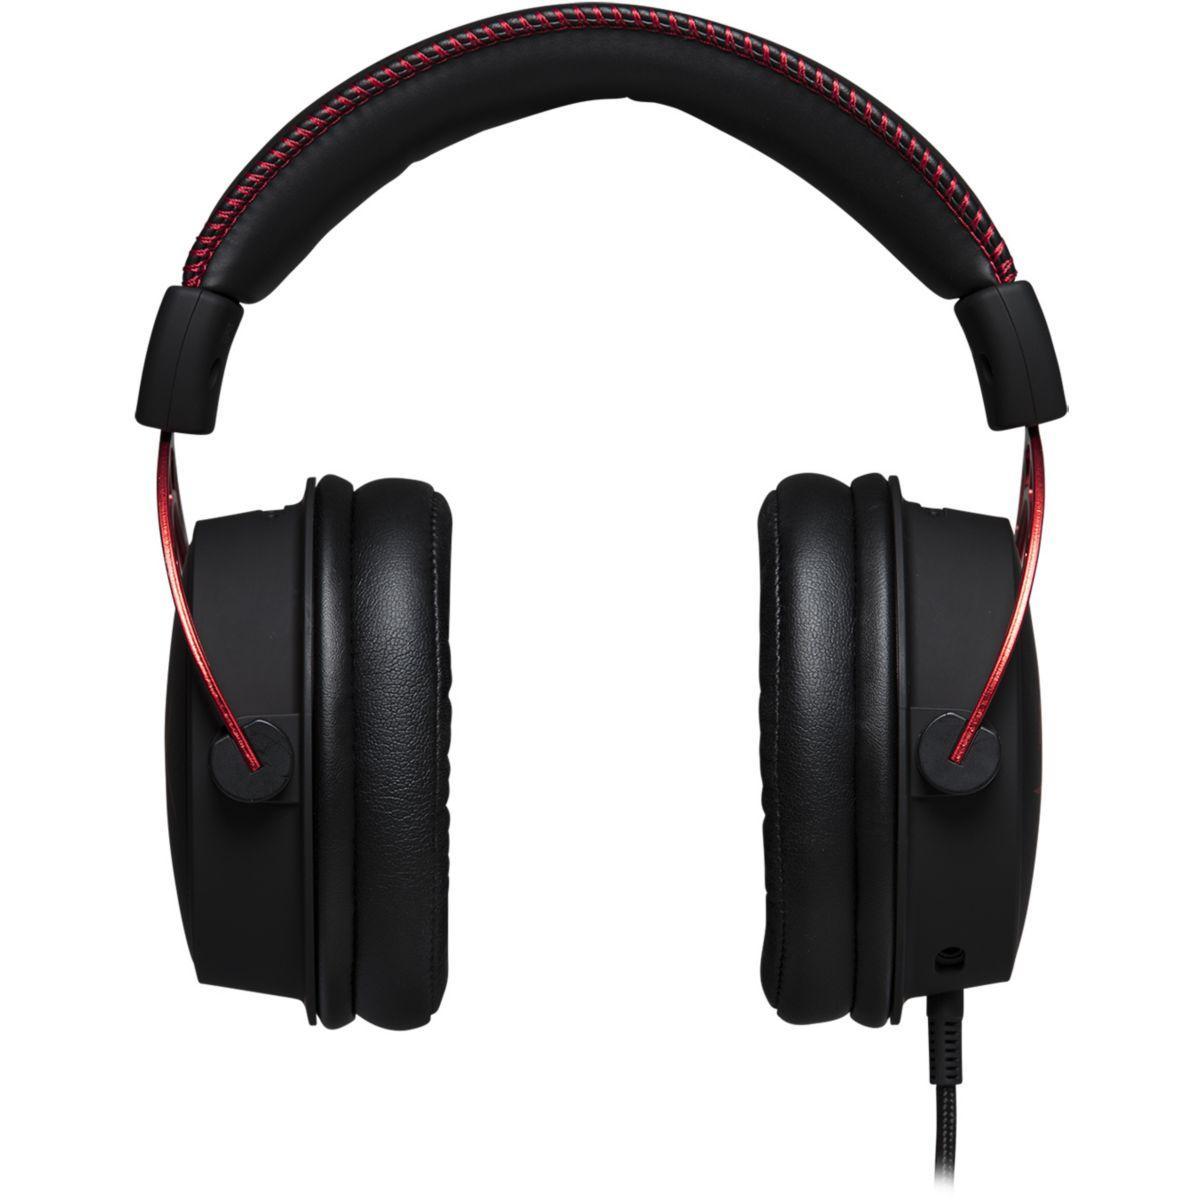 Kopfhörer Gaming mit Mikrophon Hyperx Cloud Alpha - Schwarz/Rot